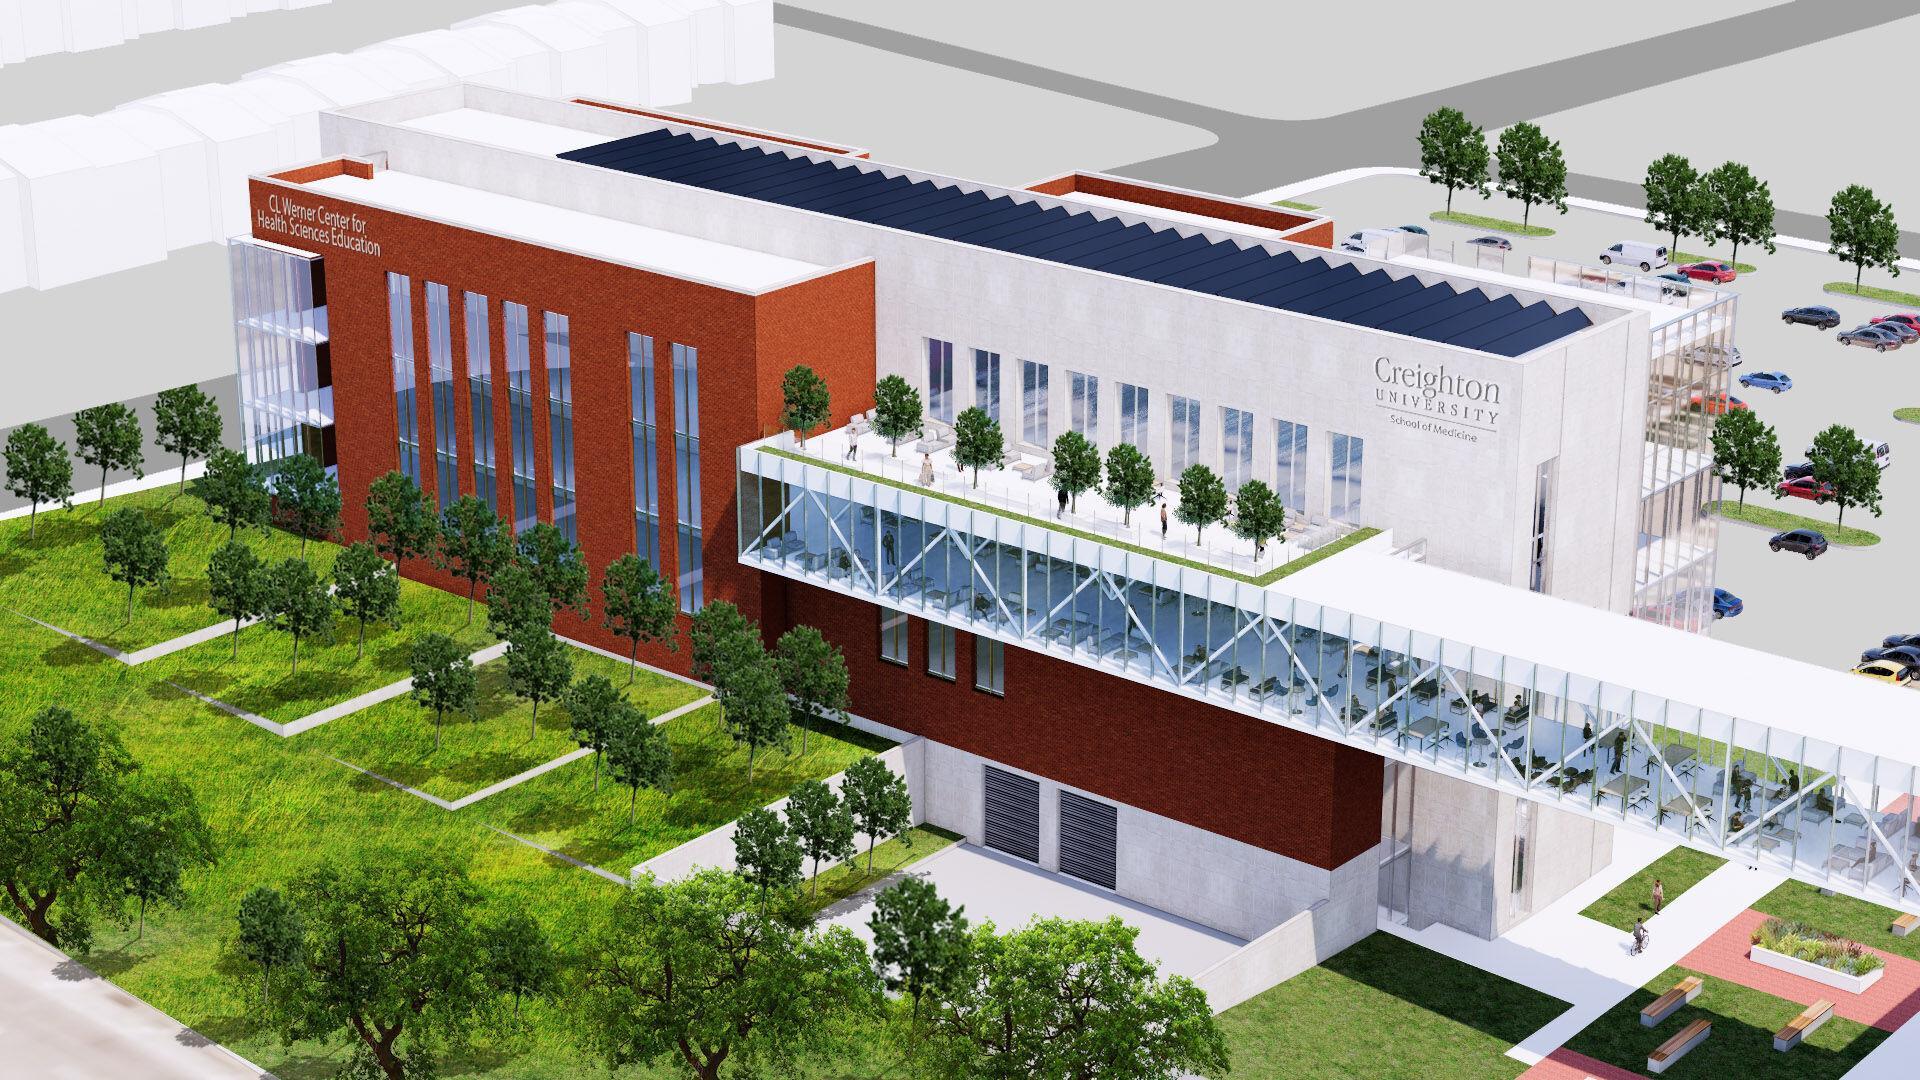 Creighton breaks ground on new home for School of Medicine